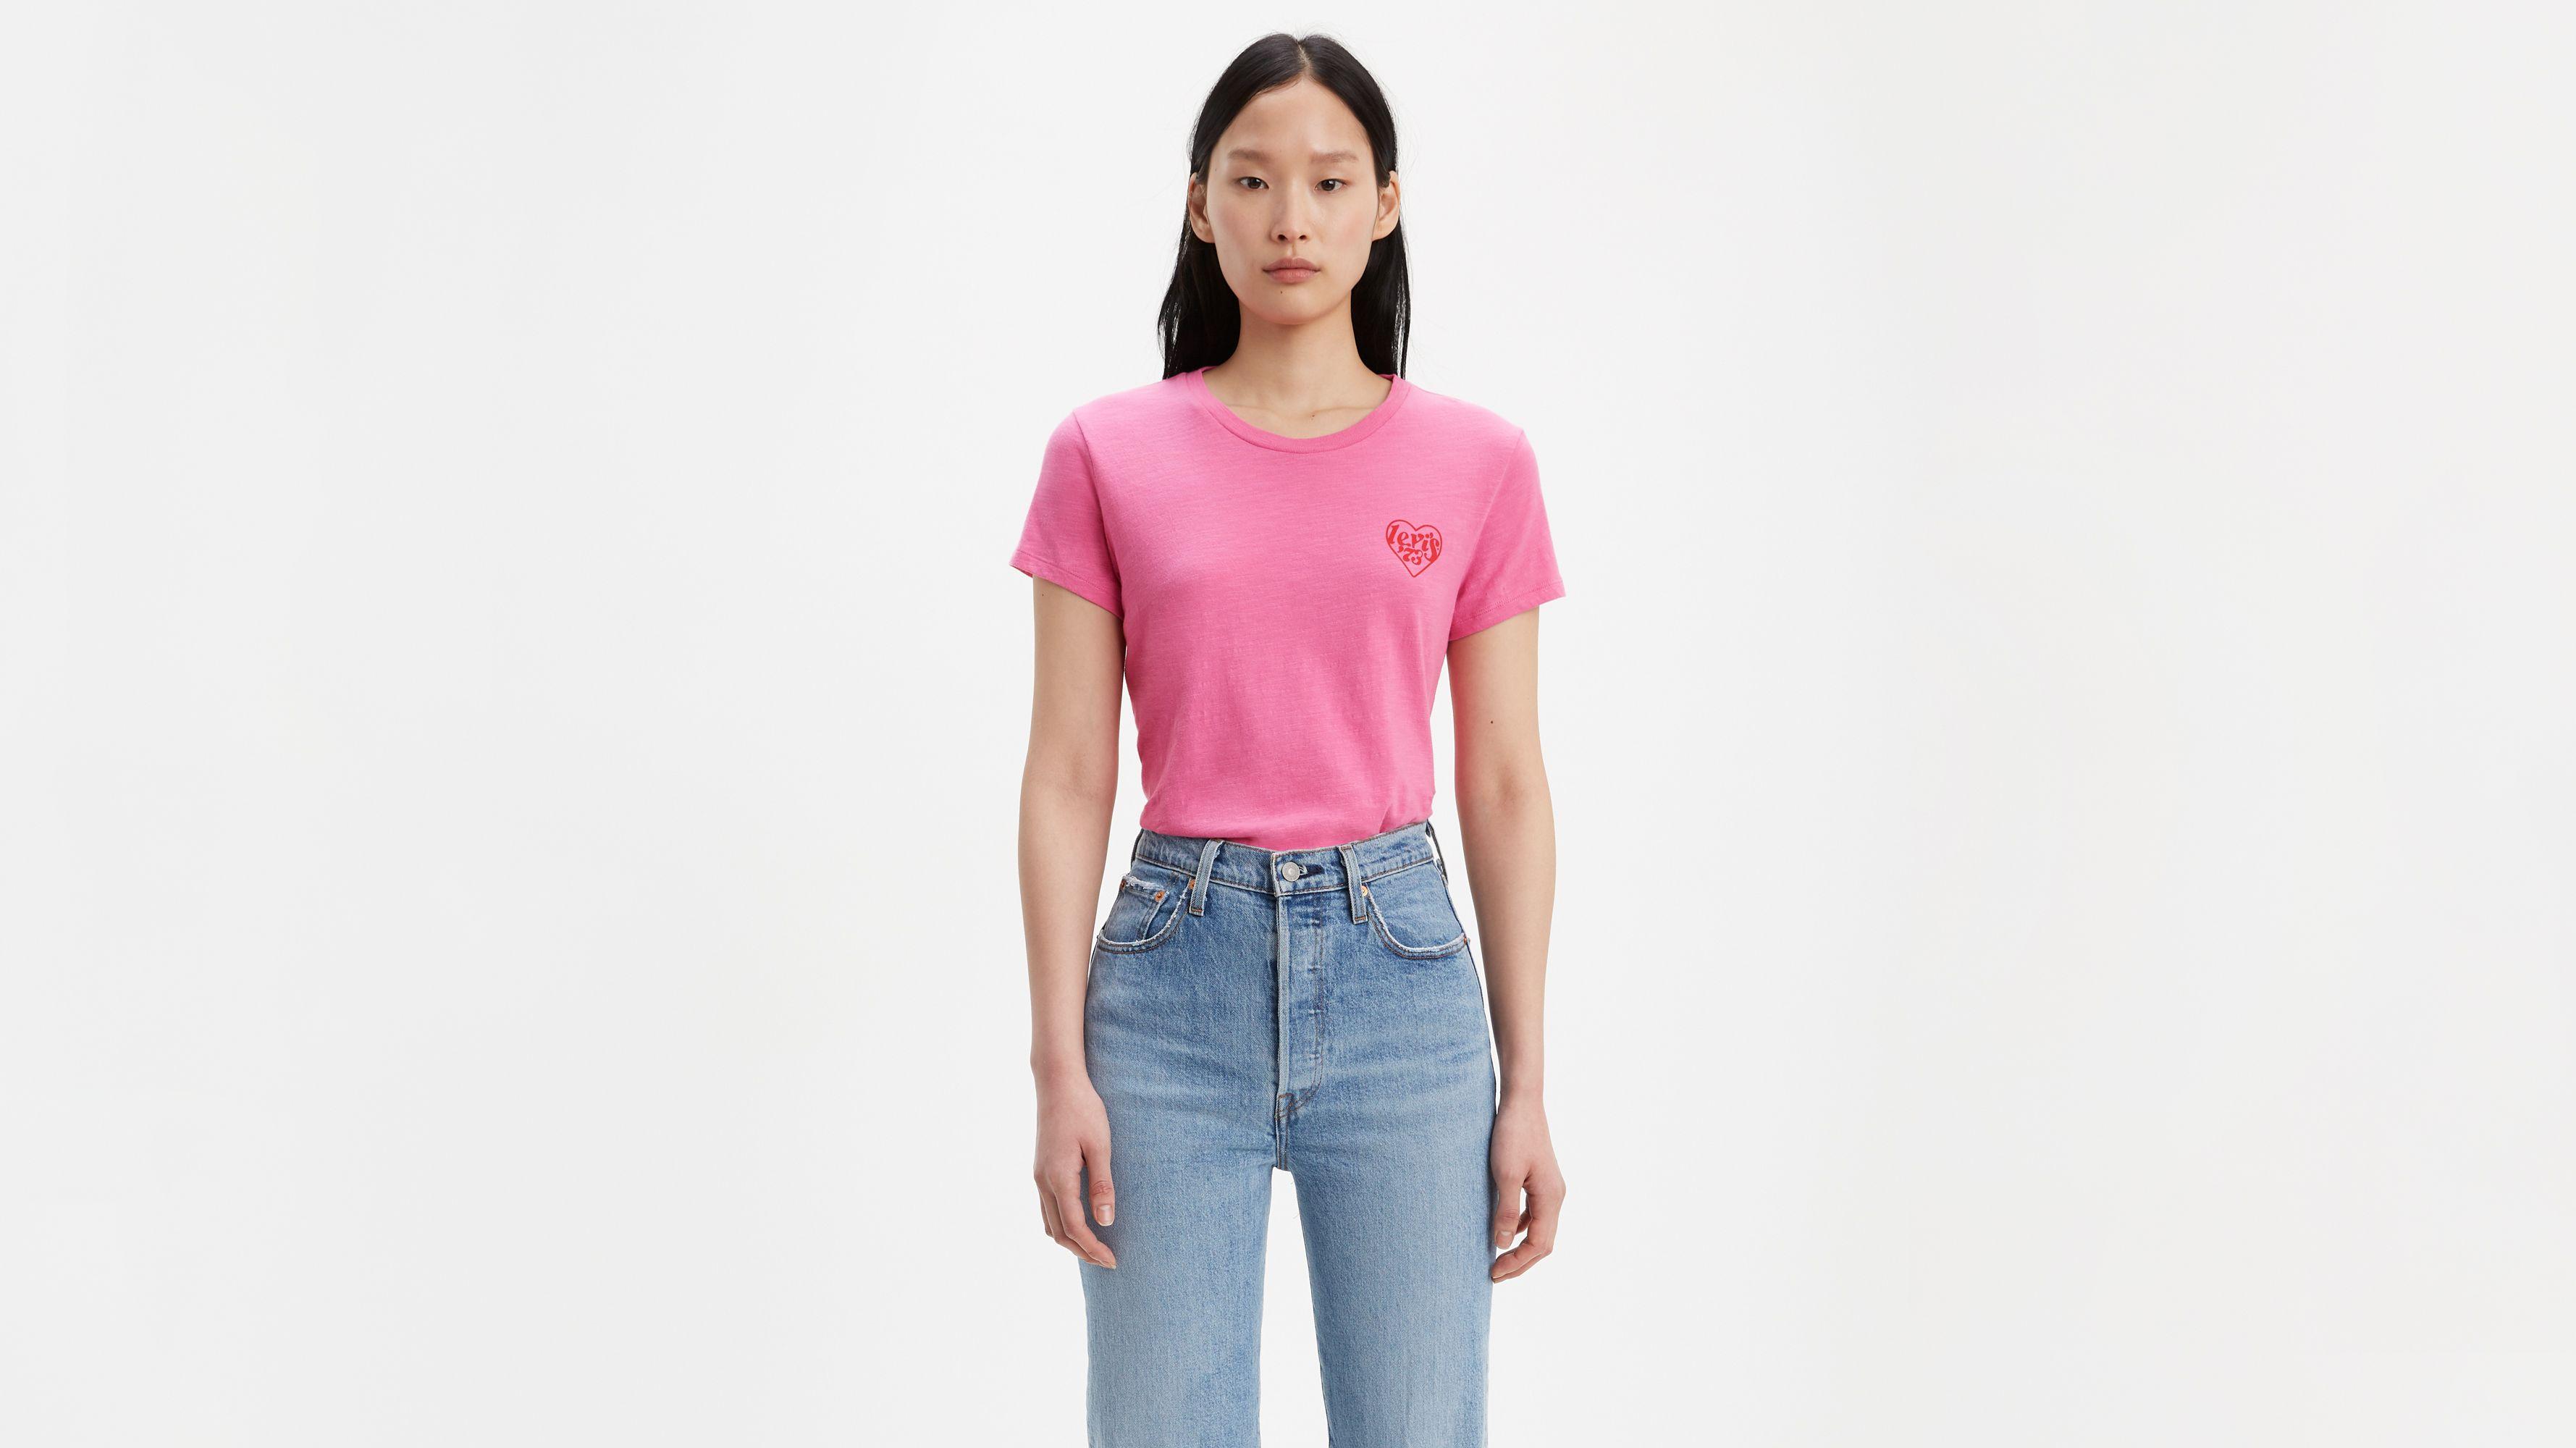 Chest Heart Graphic Tee Shirt